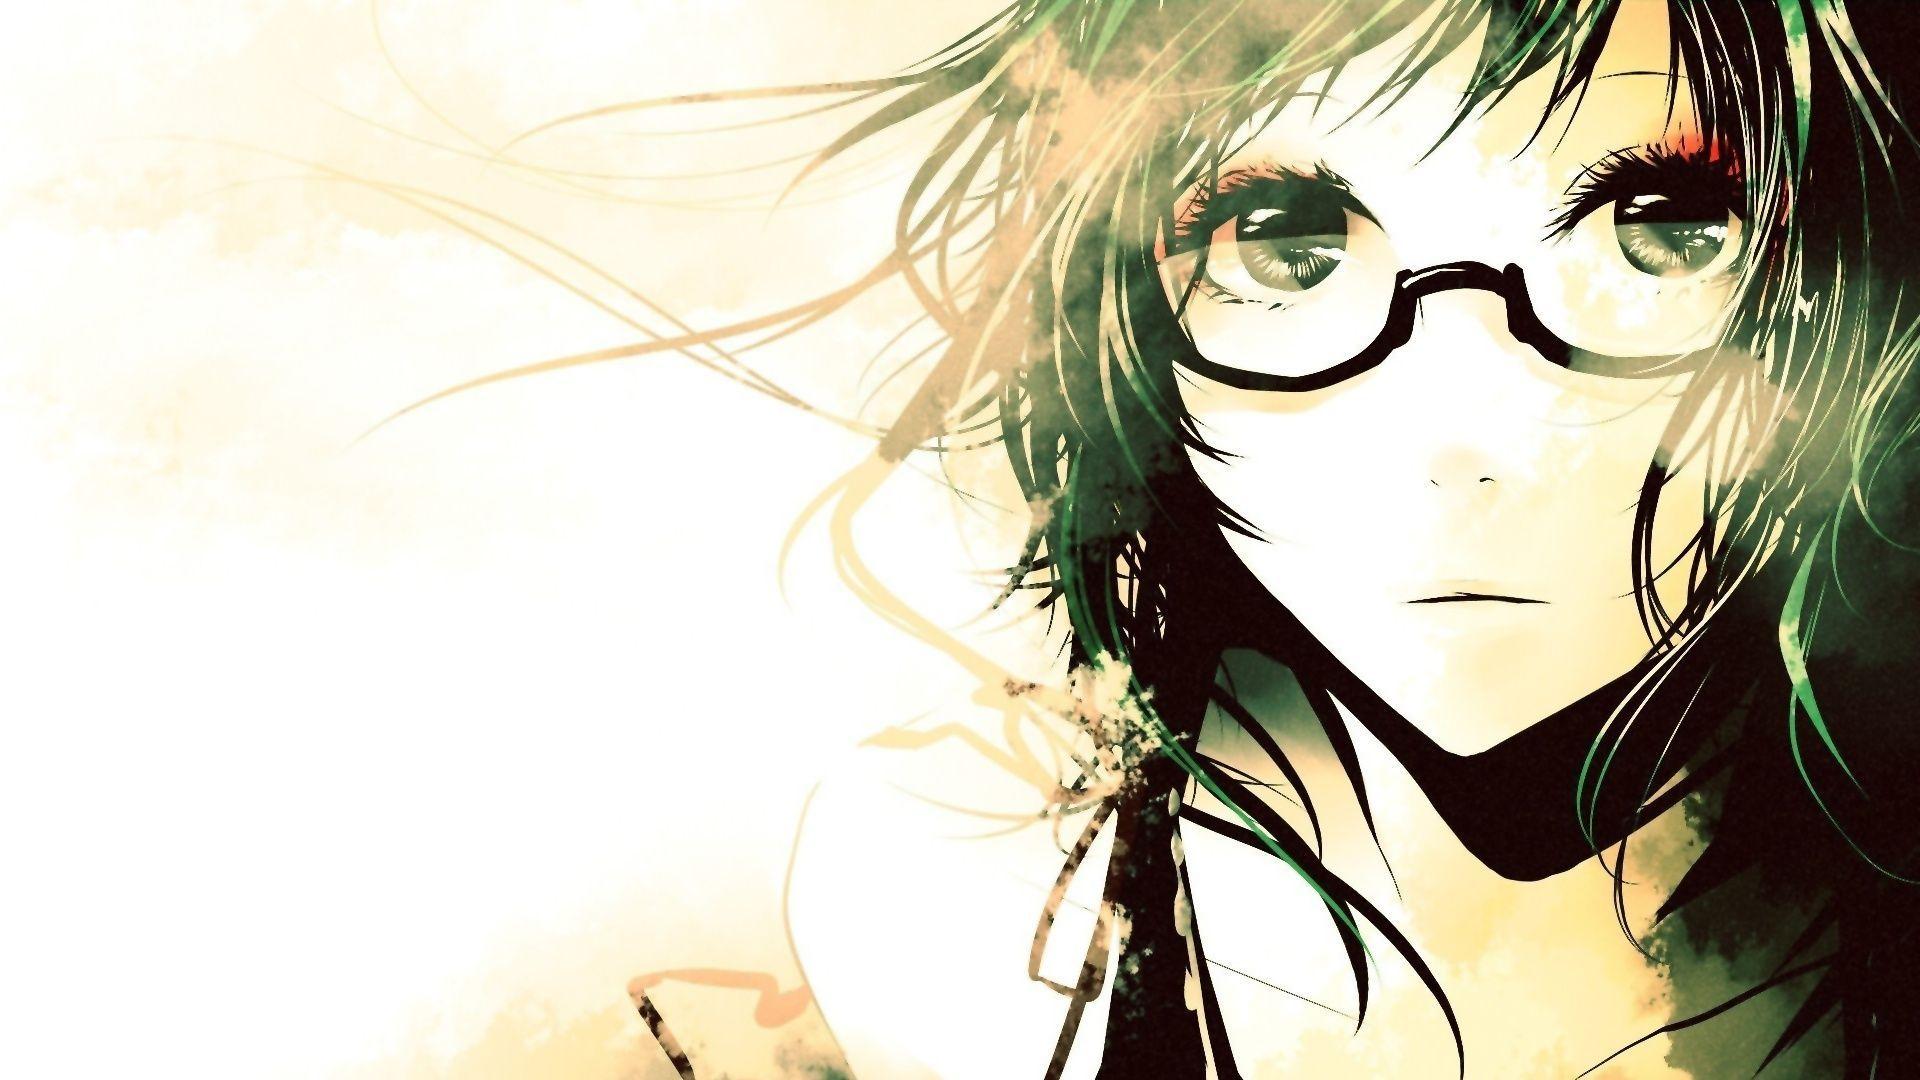 Anime Music Wallpapers HD 1920x1080